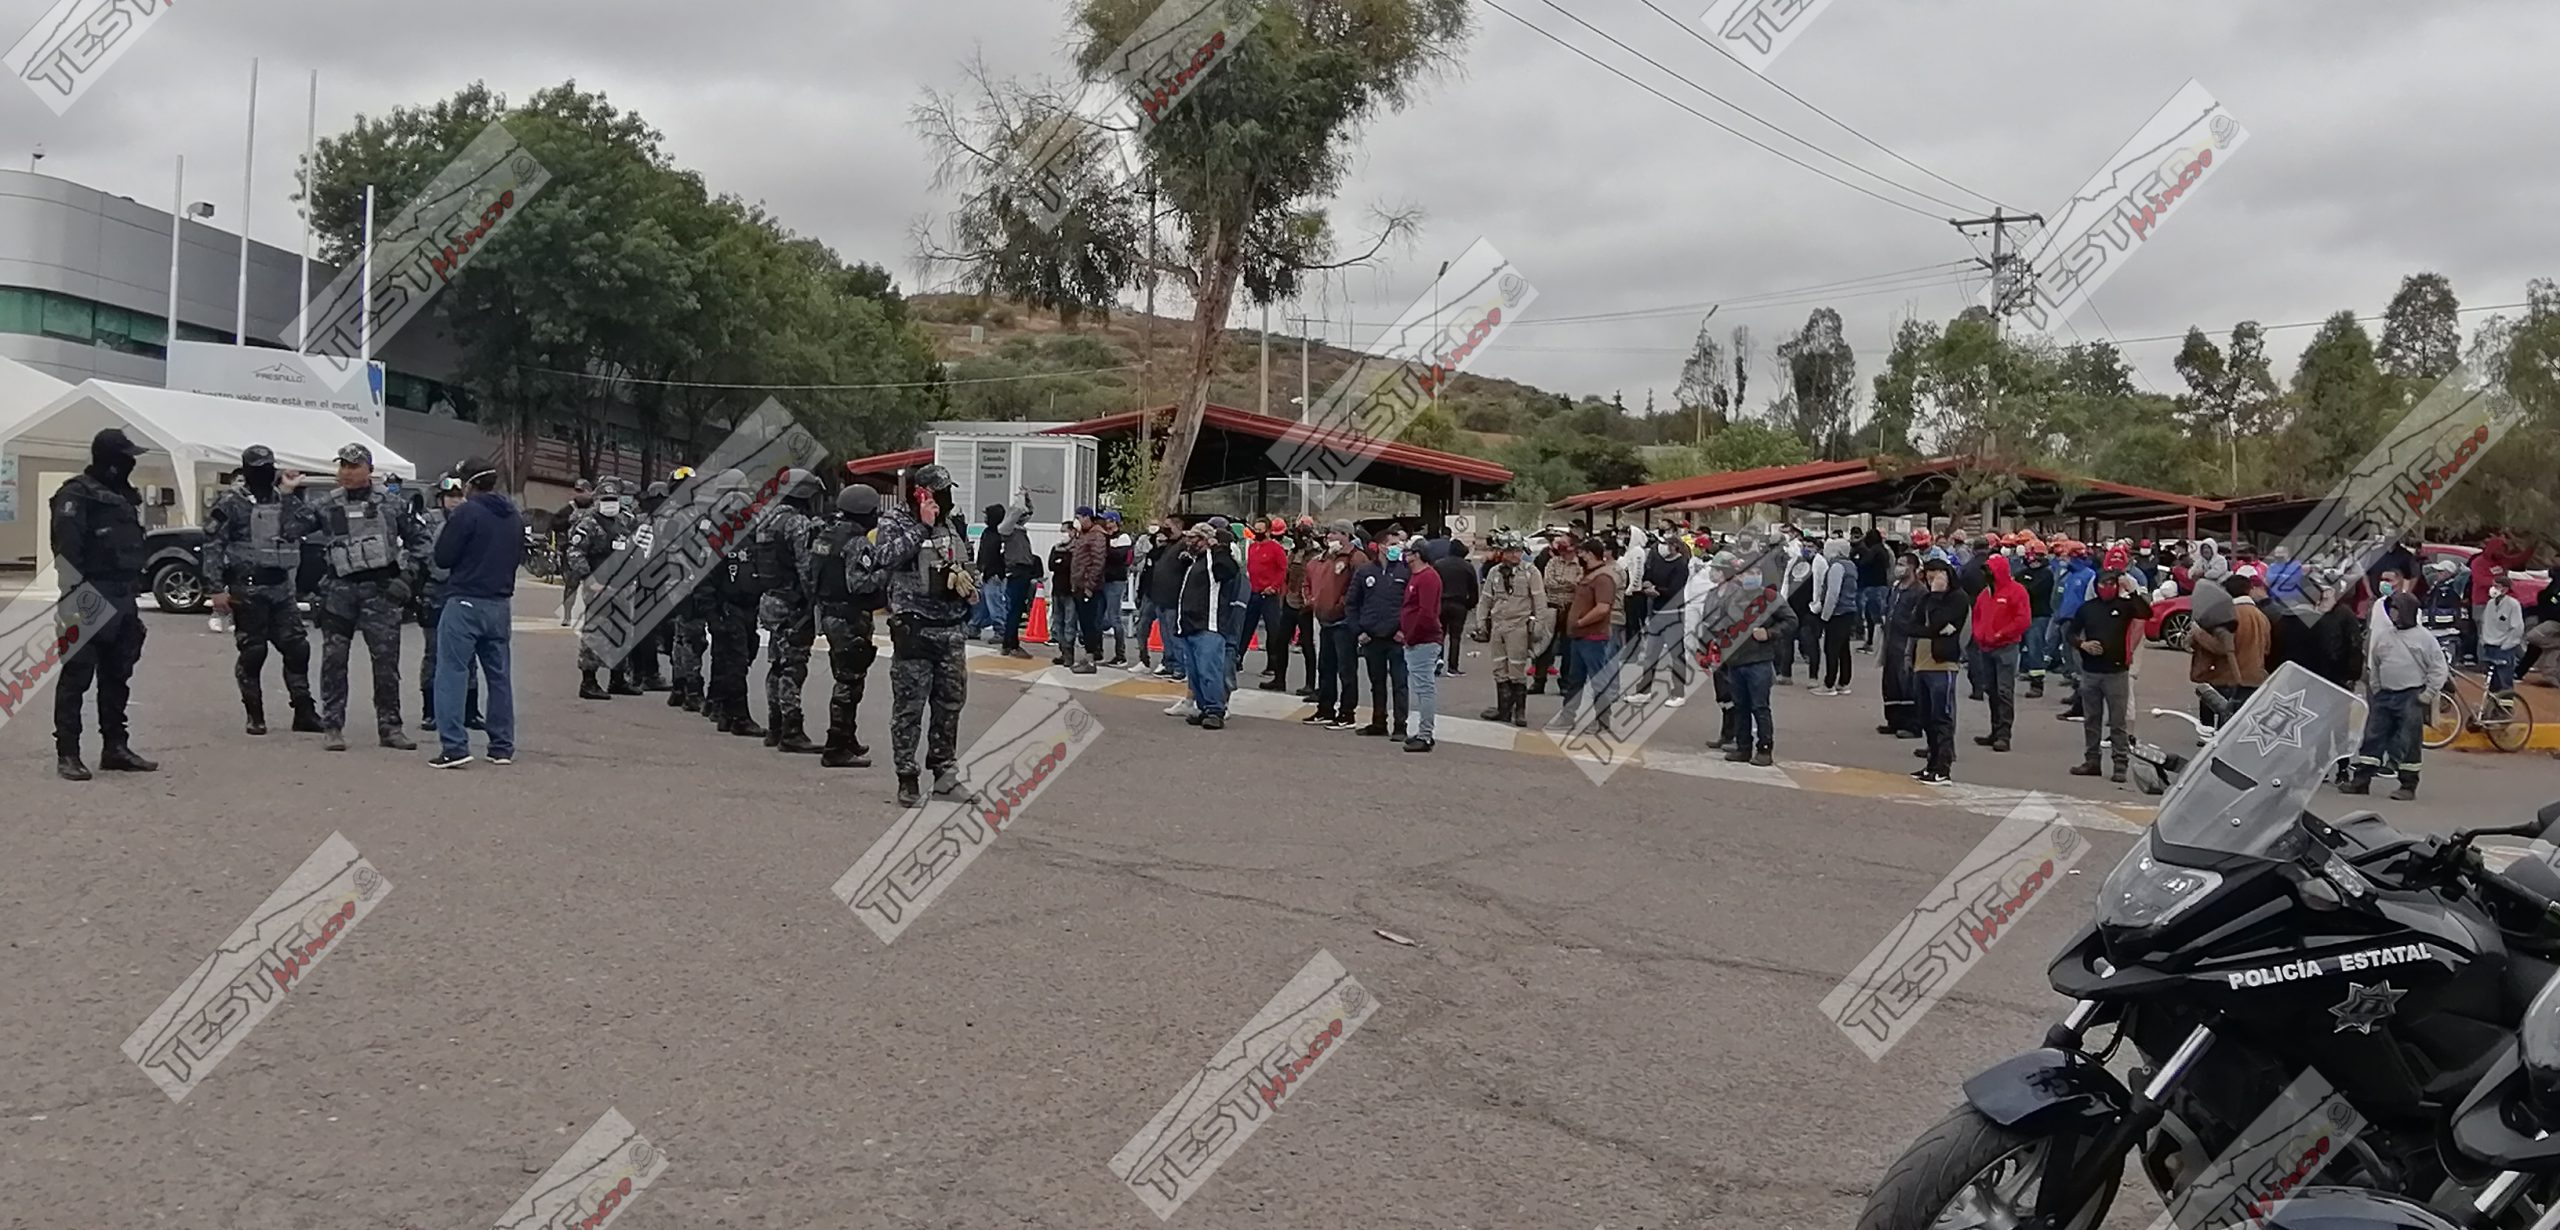 MINERA FRESNILLO REITERA RESPETO A LA AUTONOMÍA SINDICAL